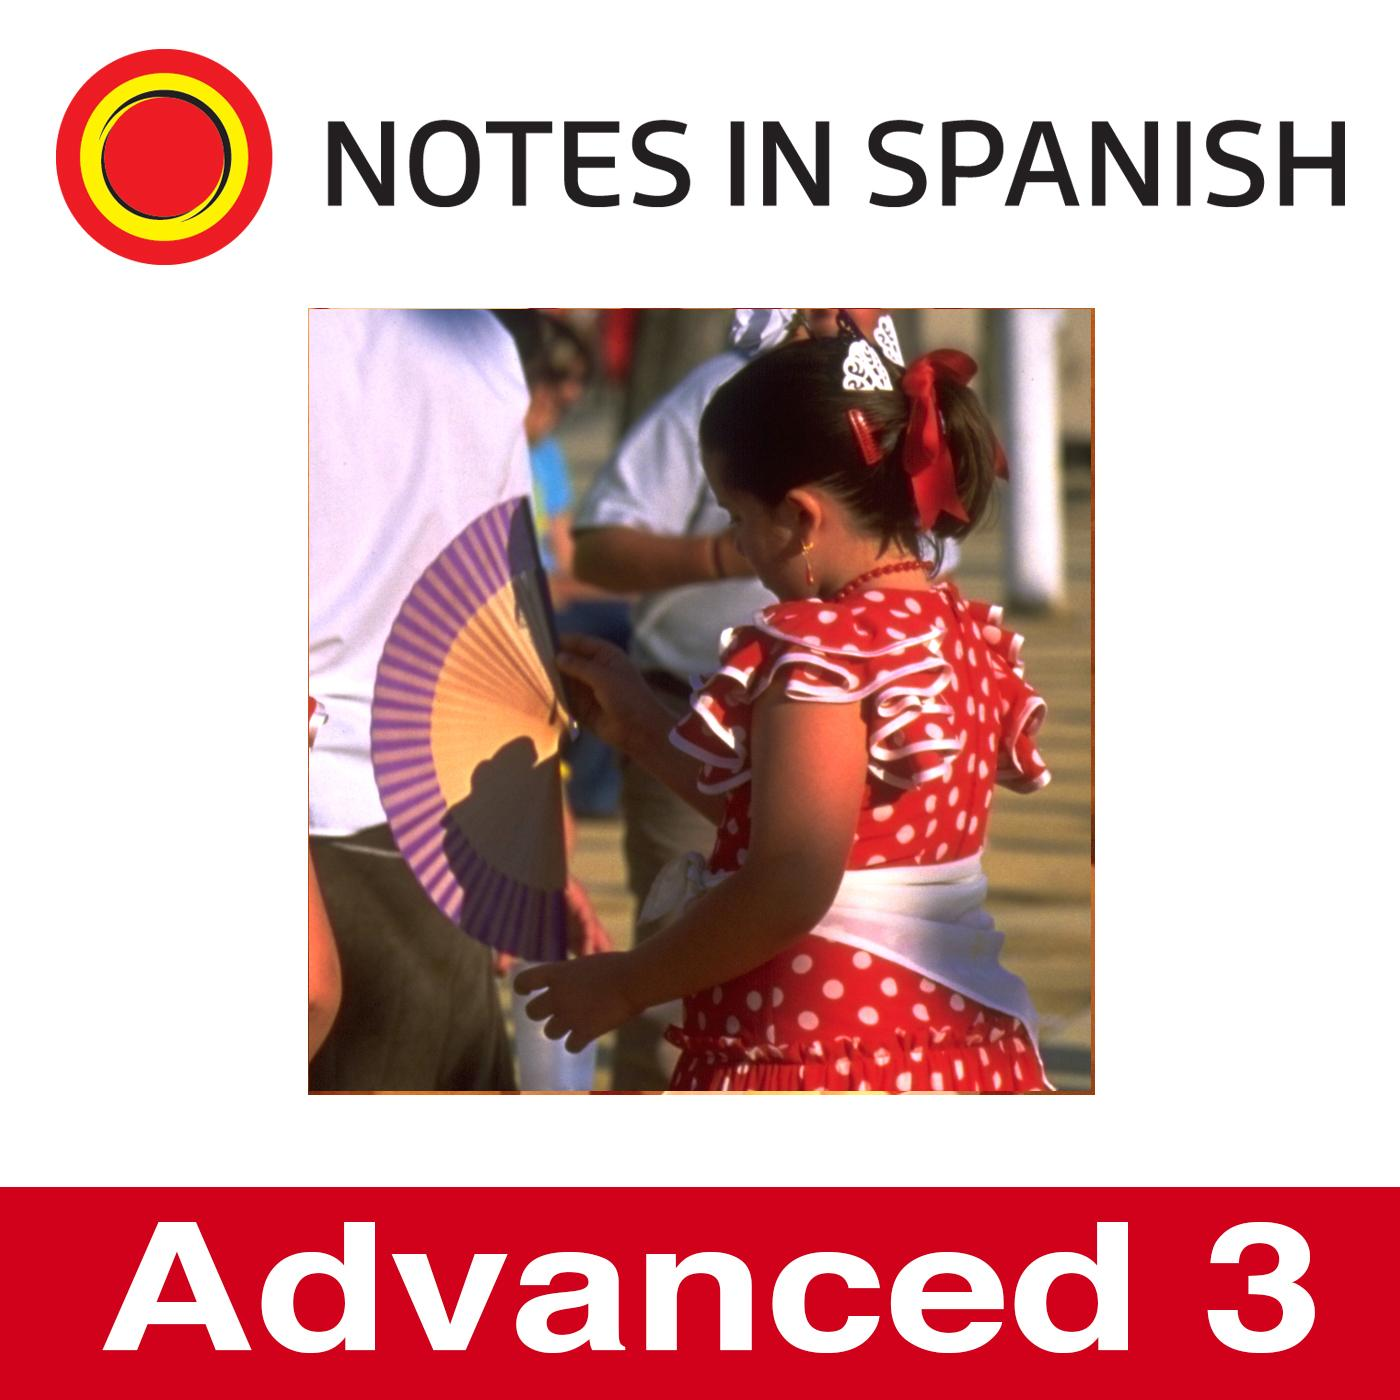 NIS Advanced S3 - 11 - Cervantes